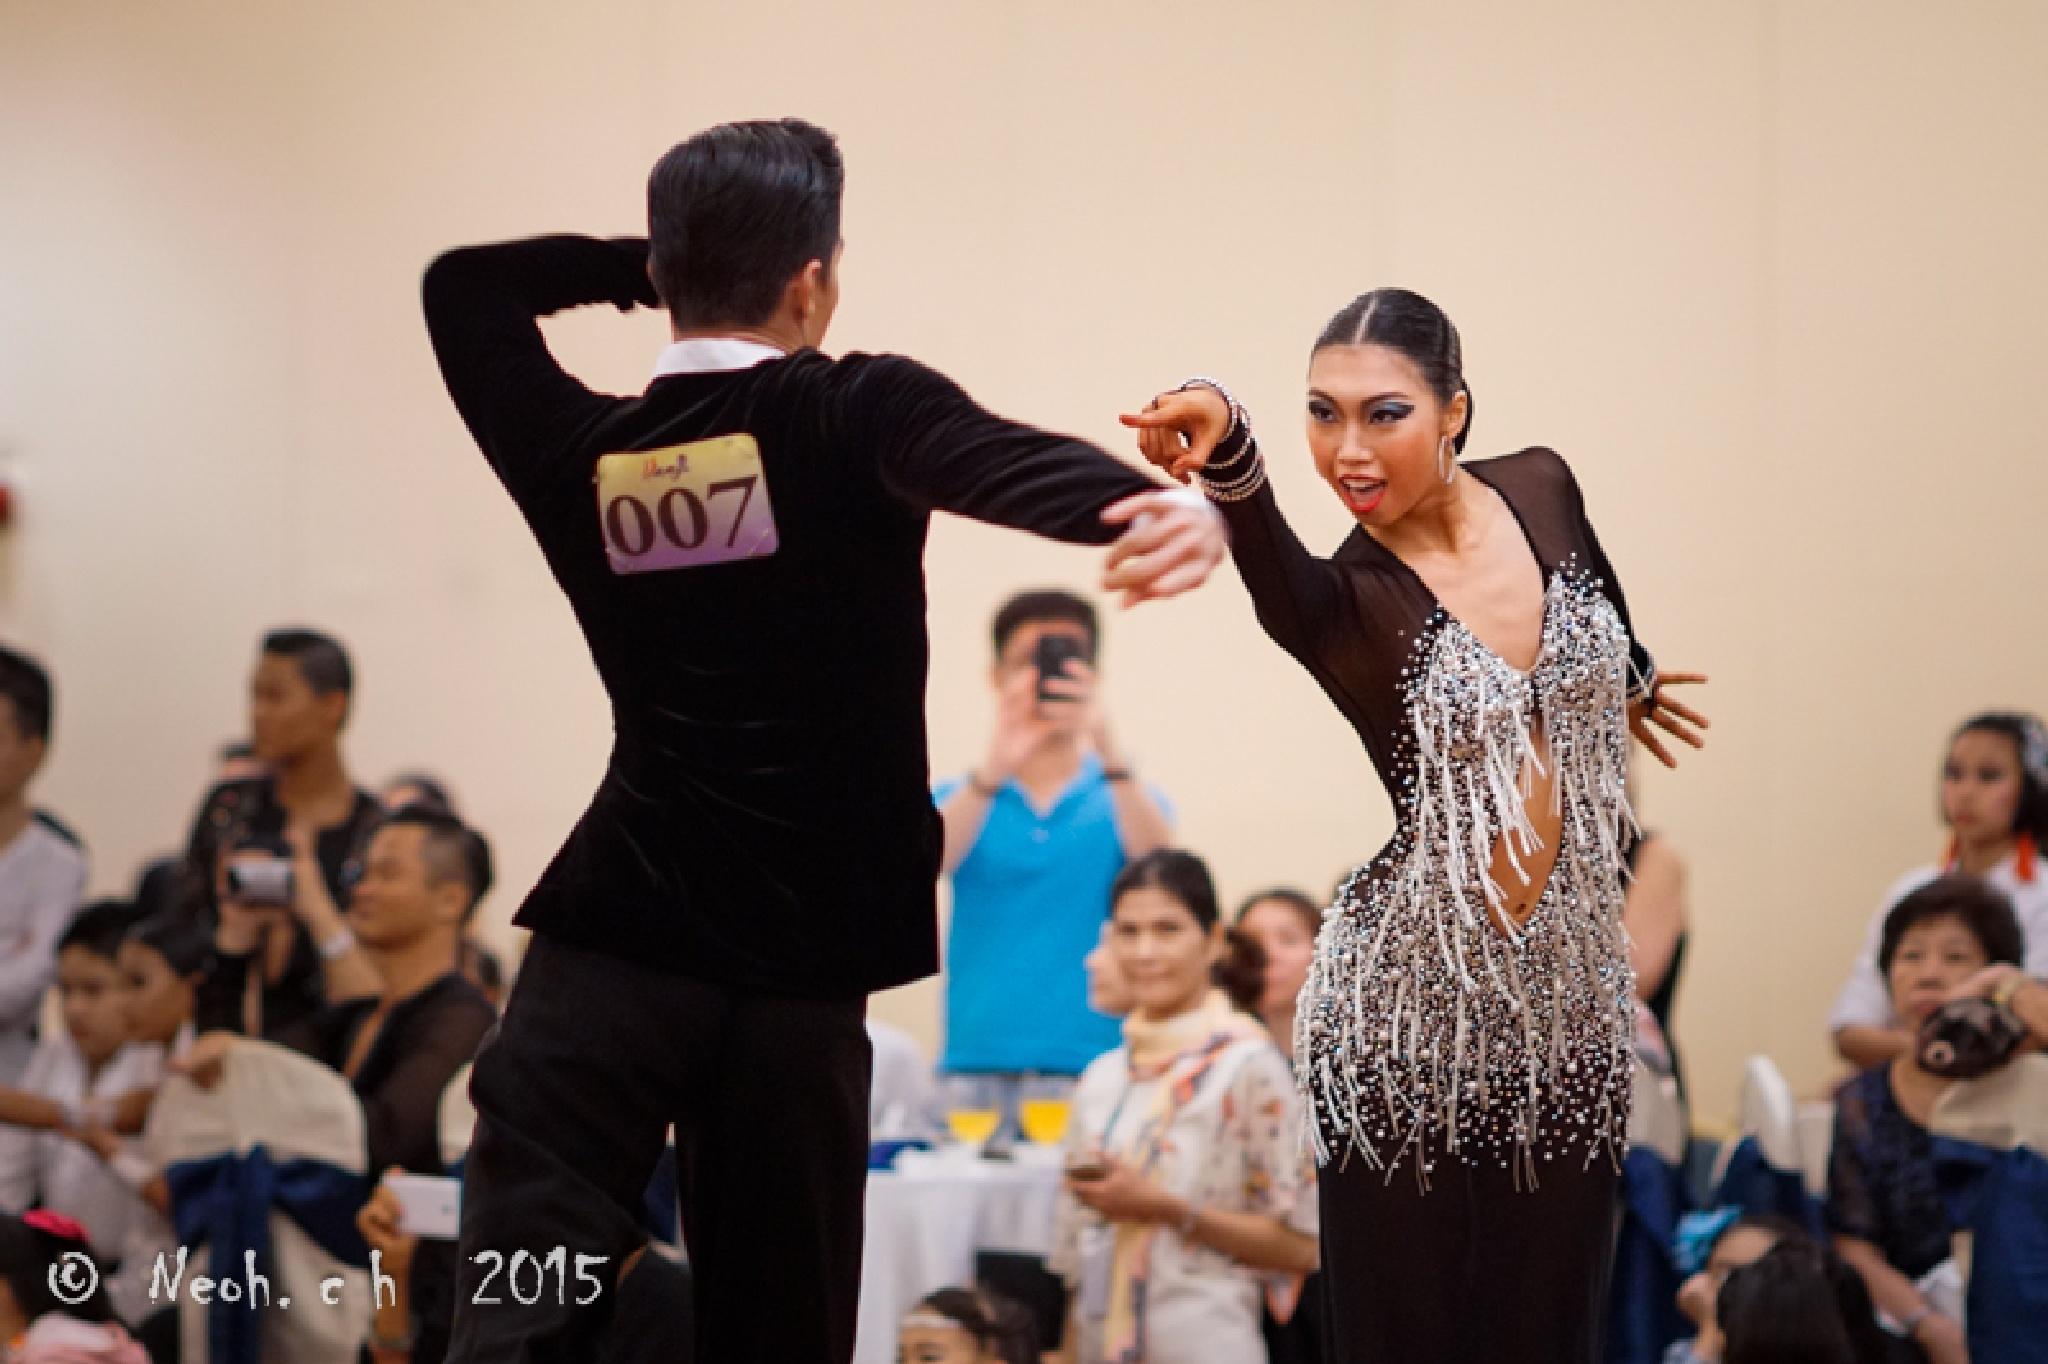 Dance by neohch